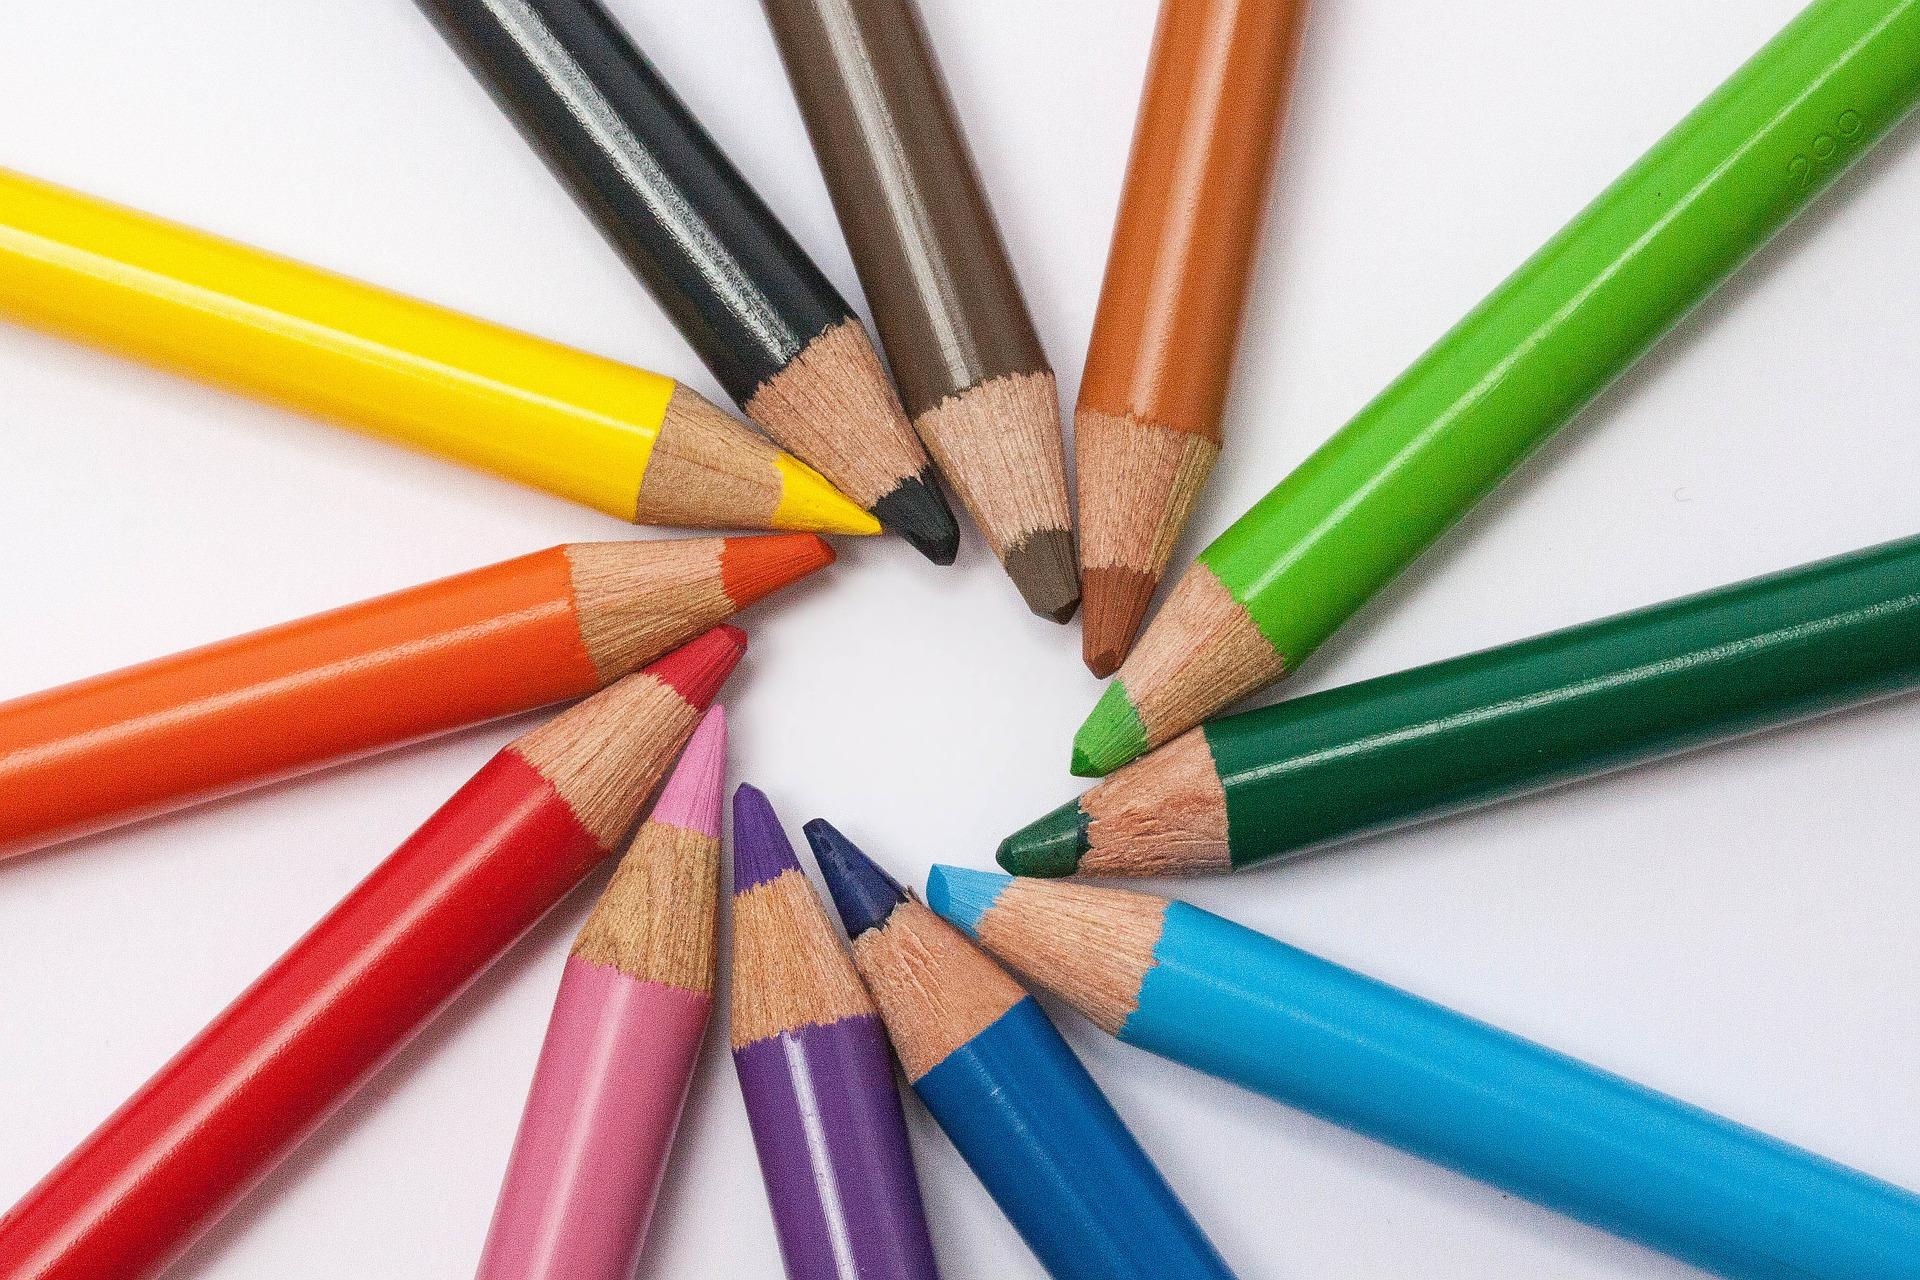 colored-pencils-374771_1920